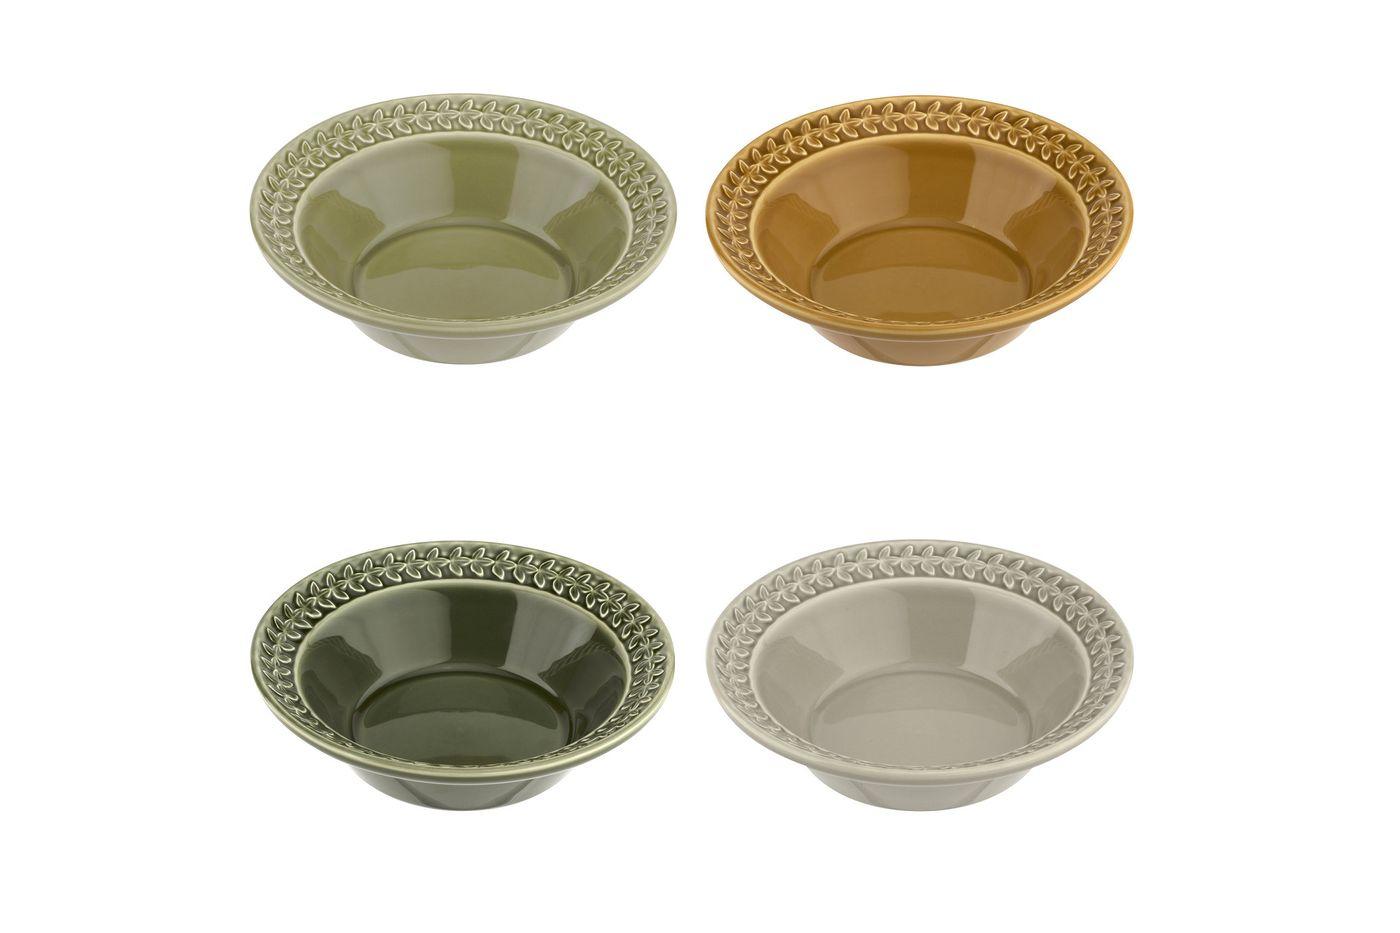 Portmeirion Botanic Garden Harmony Cereal Bowl - Set of 4 20cm thumb 1